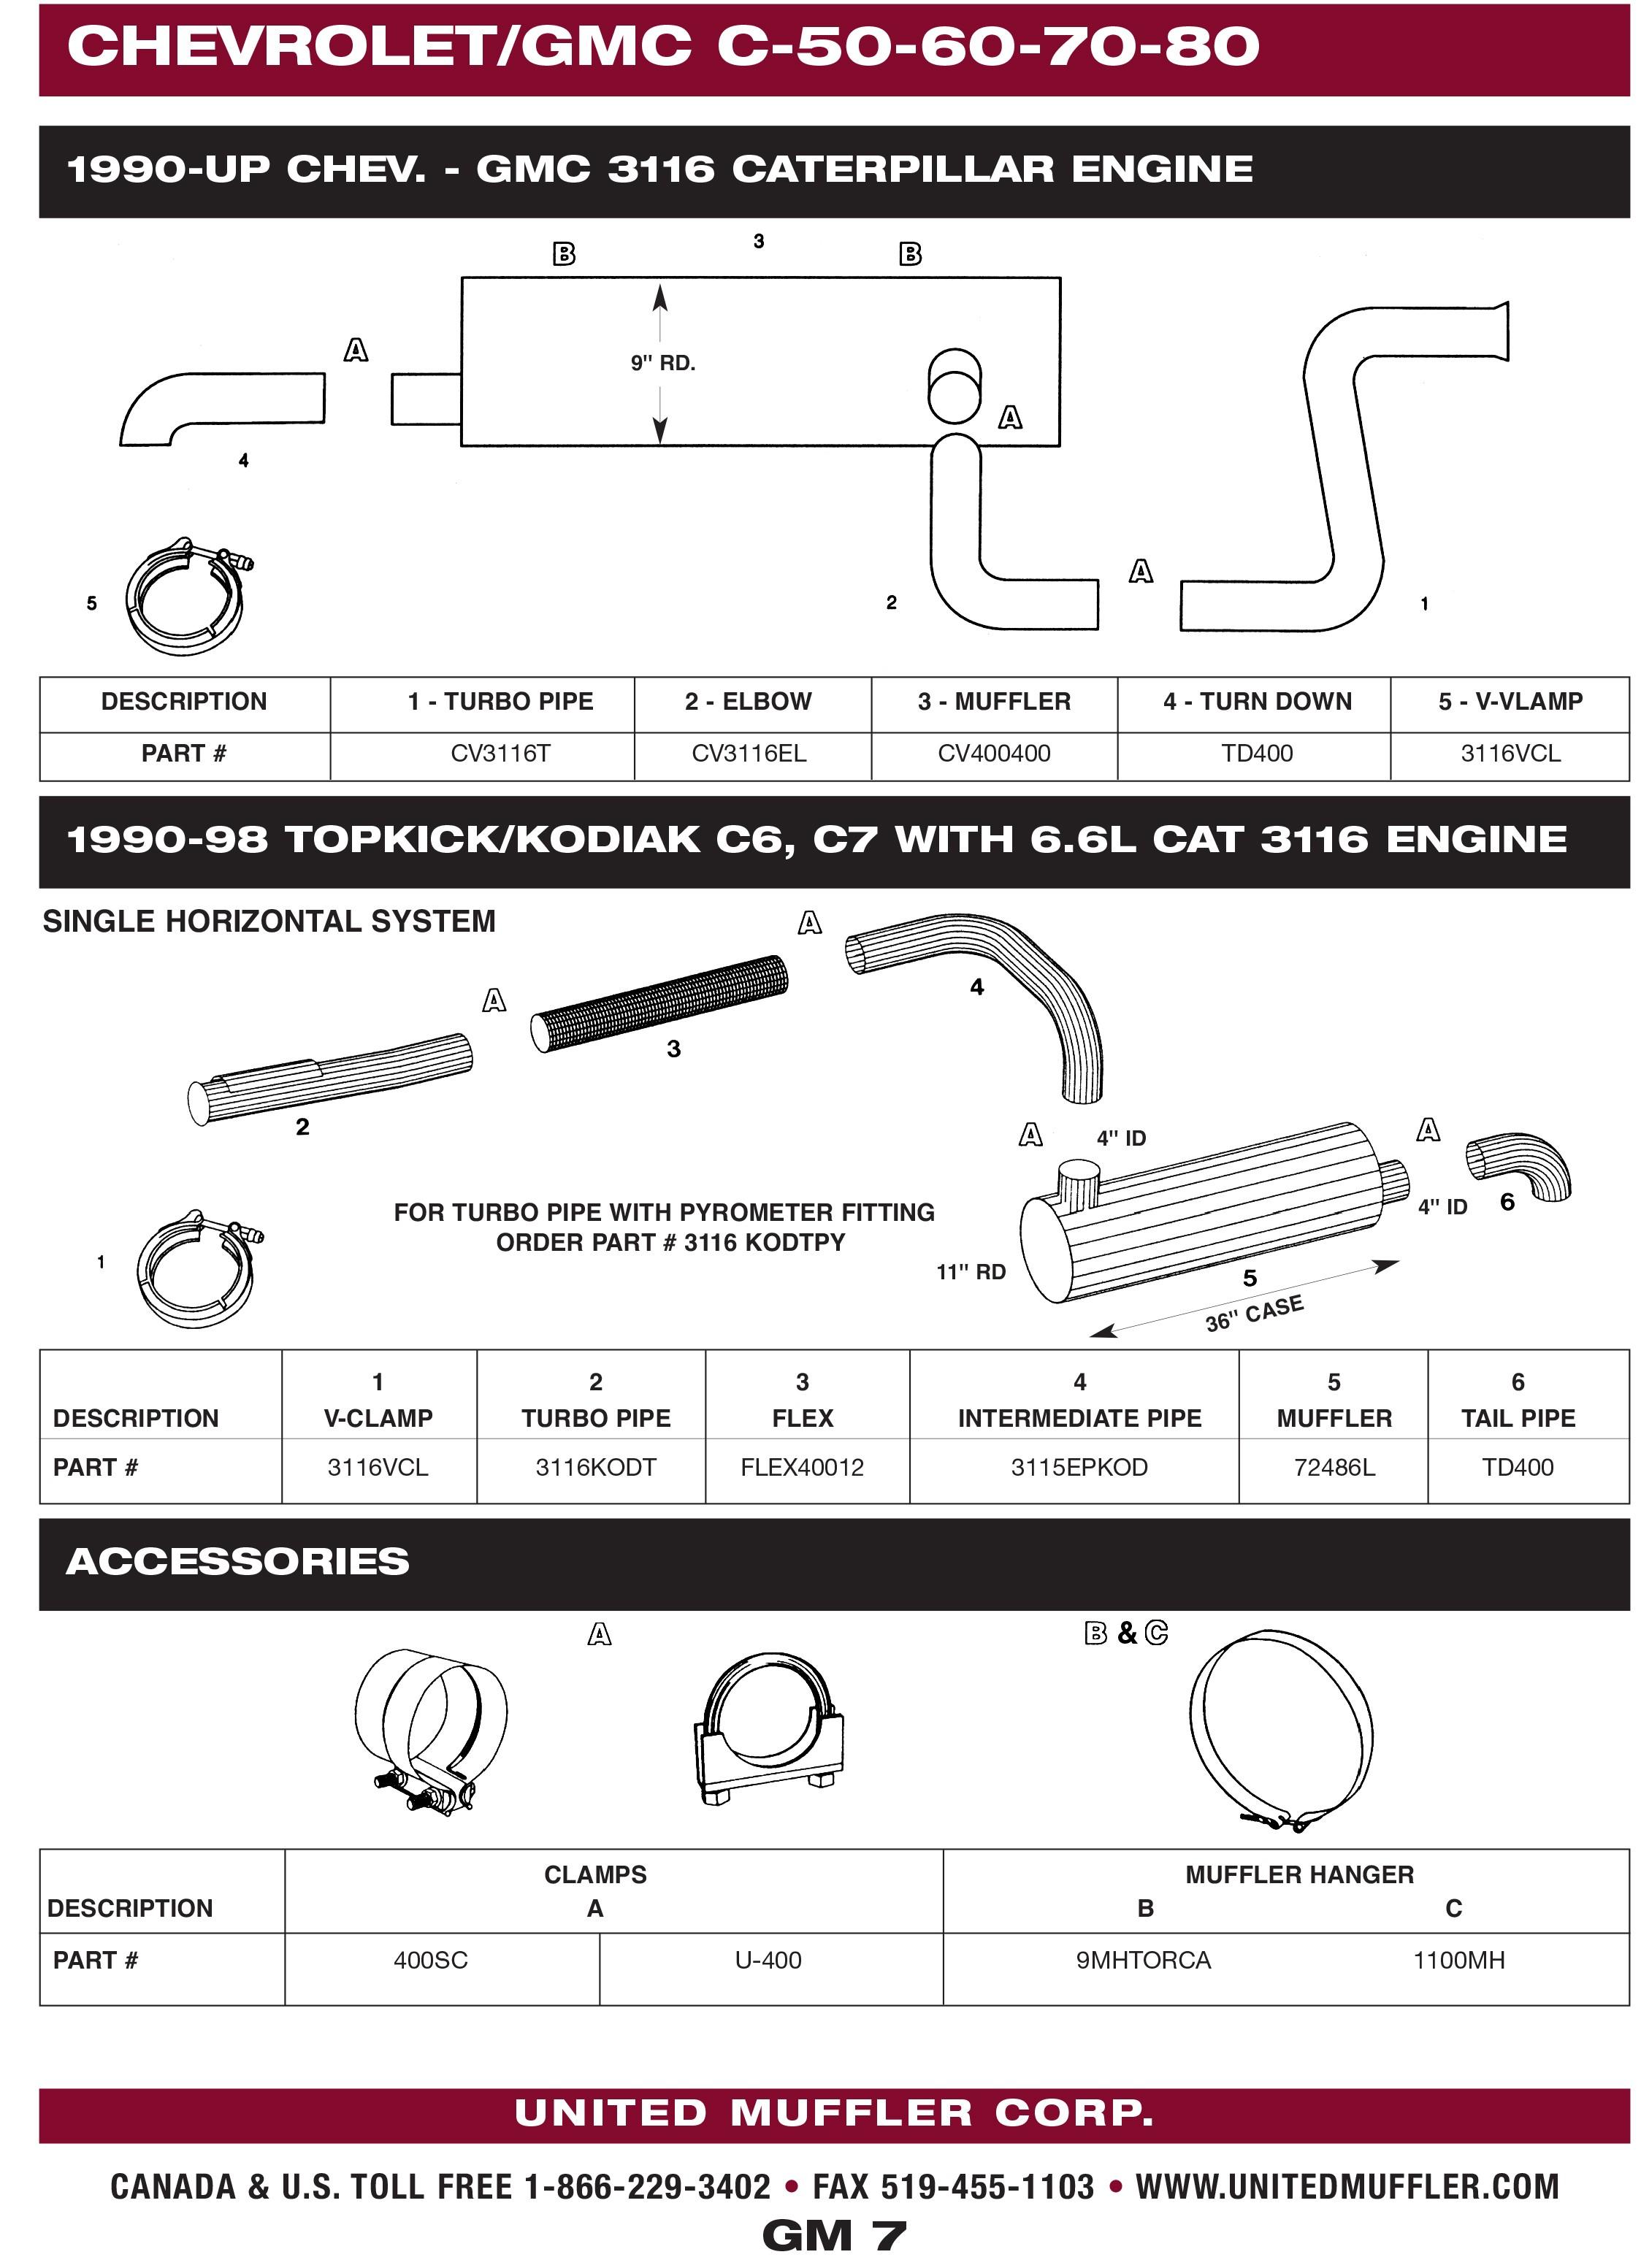 Caterpillar 3116 Engine Diagram Chev Gmc Of Caterpillar 3116 Engine Diagram